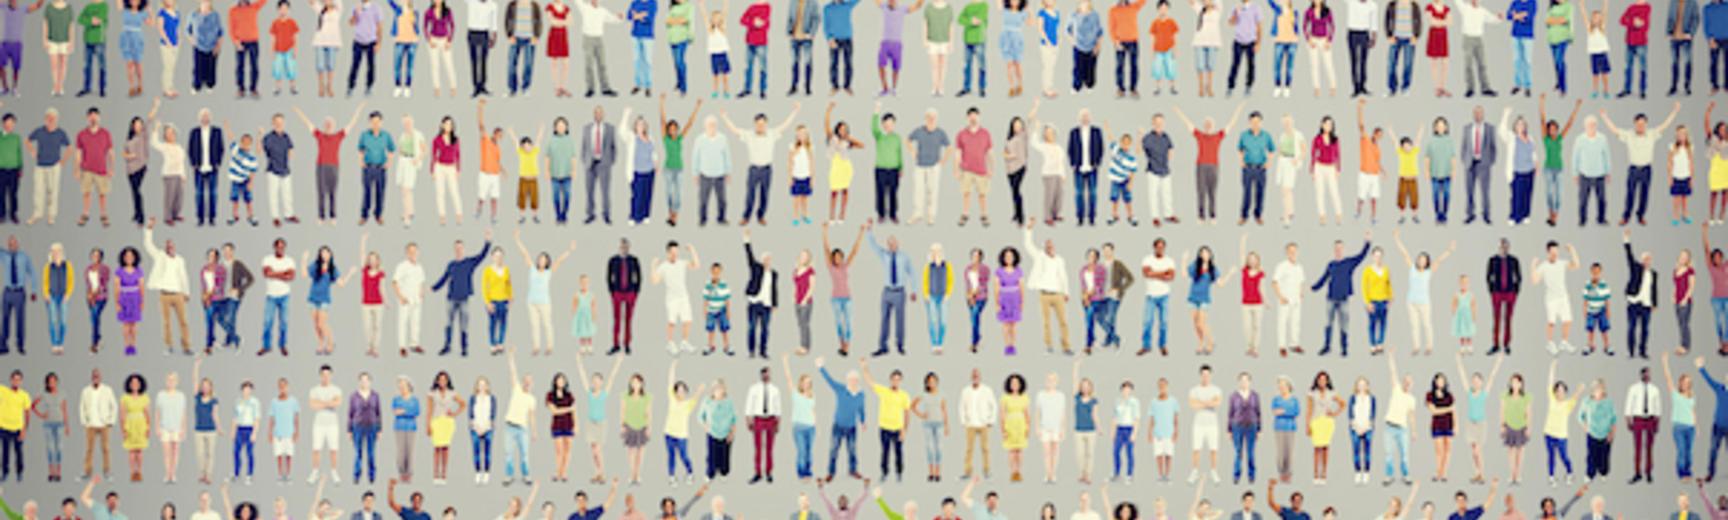 diverse people demographics